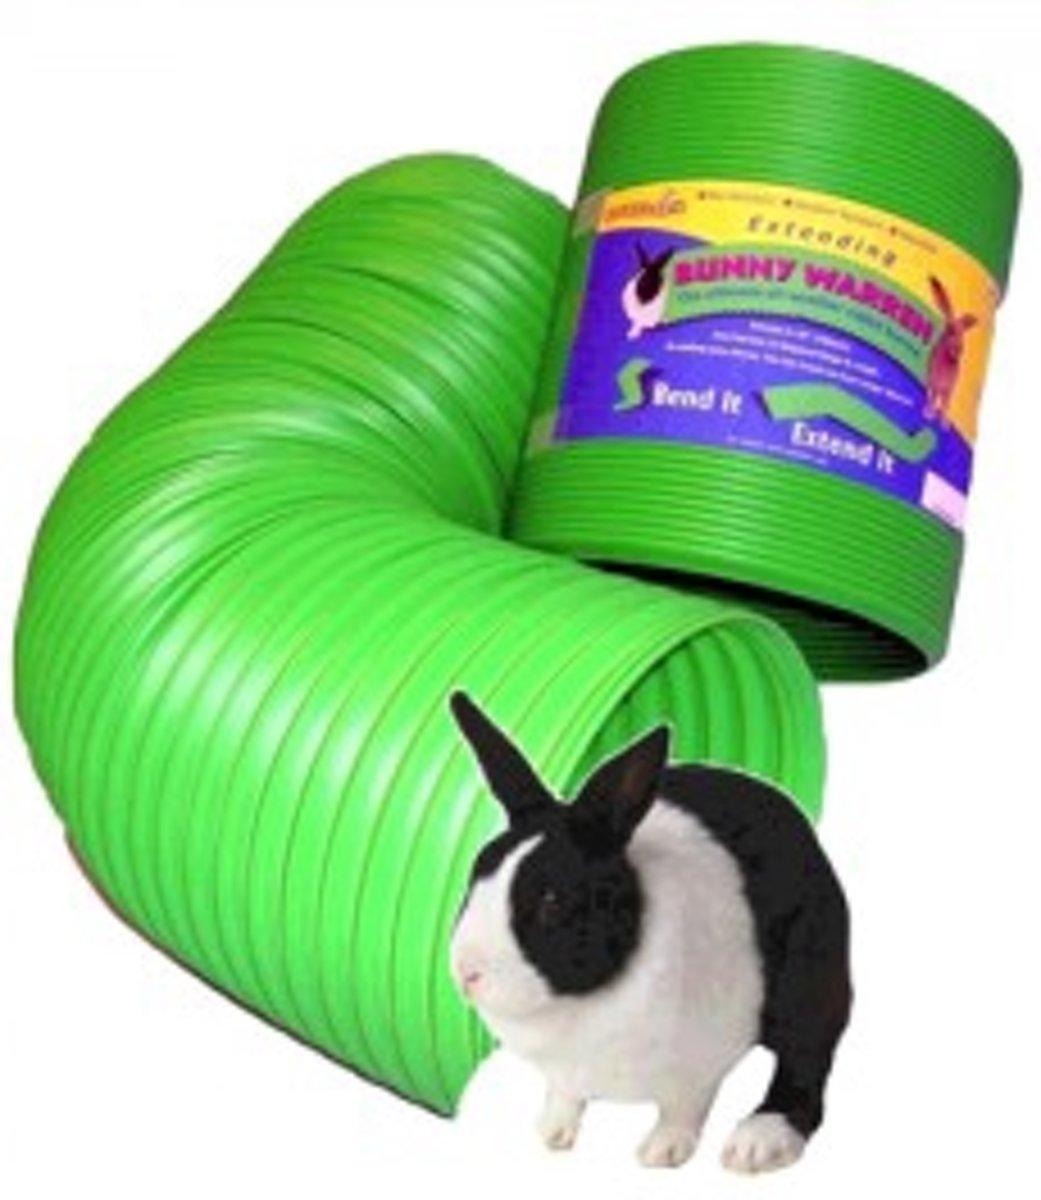 Snugglesafe Bunny Warren konijnentunnel